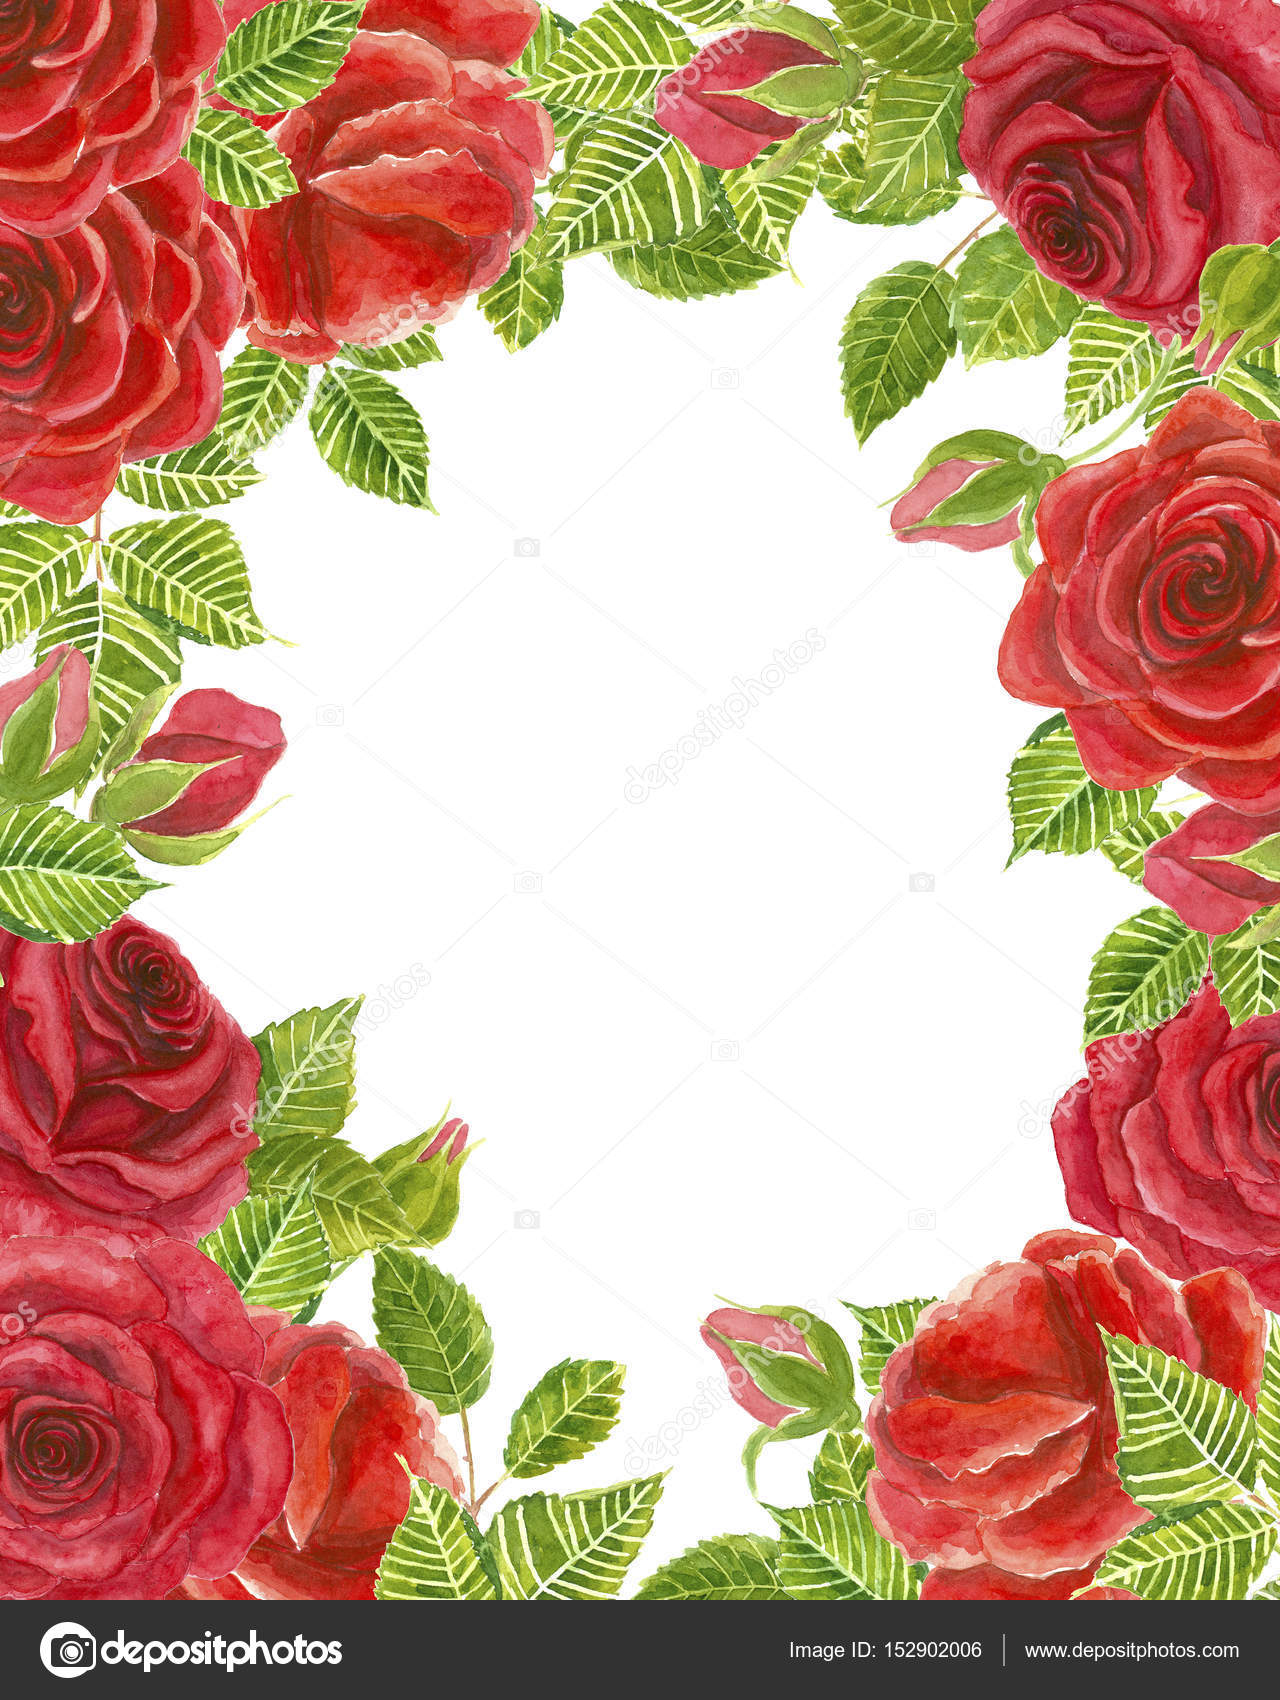 Cornice di rose rosse foto stock katerinamk 152902006 for Quadri con rose rosse